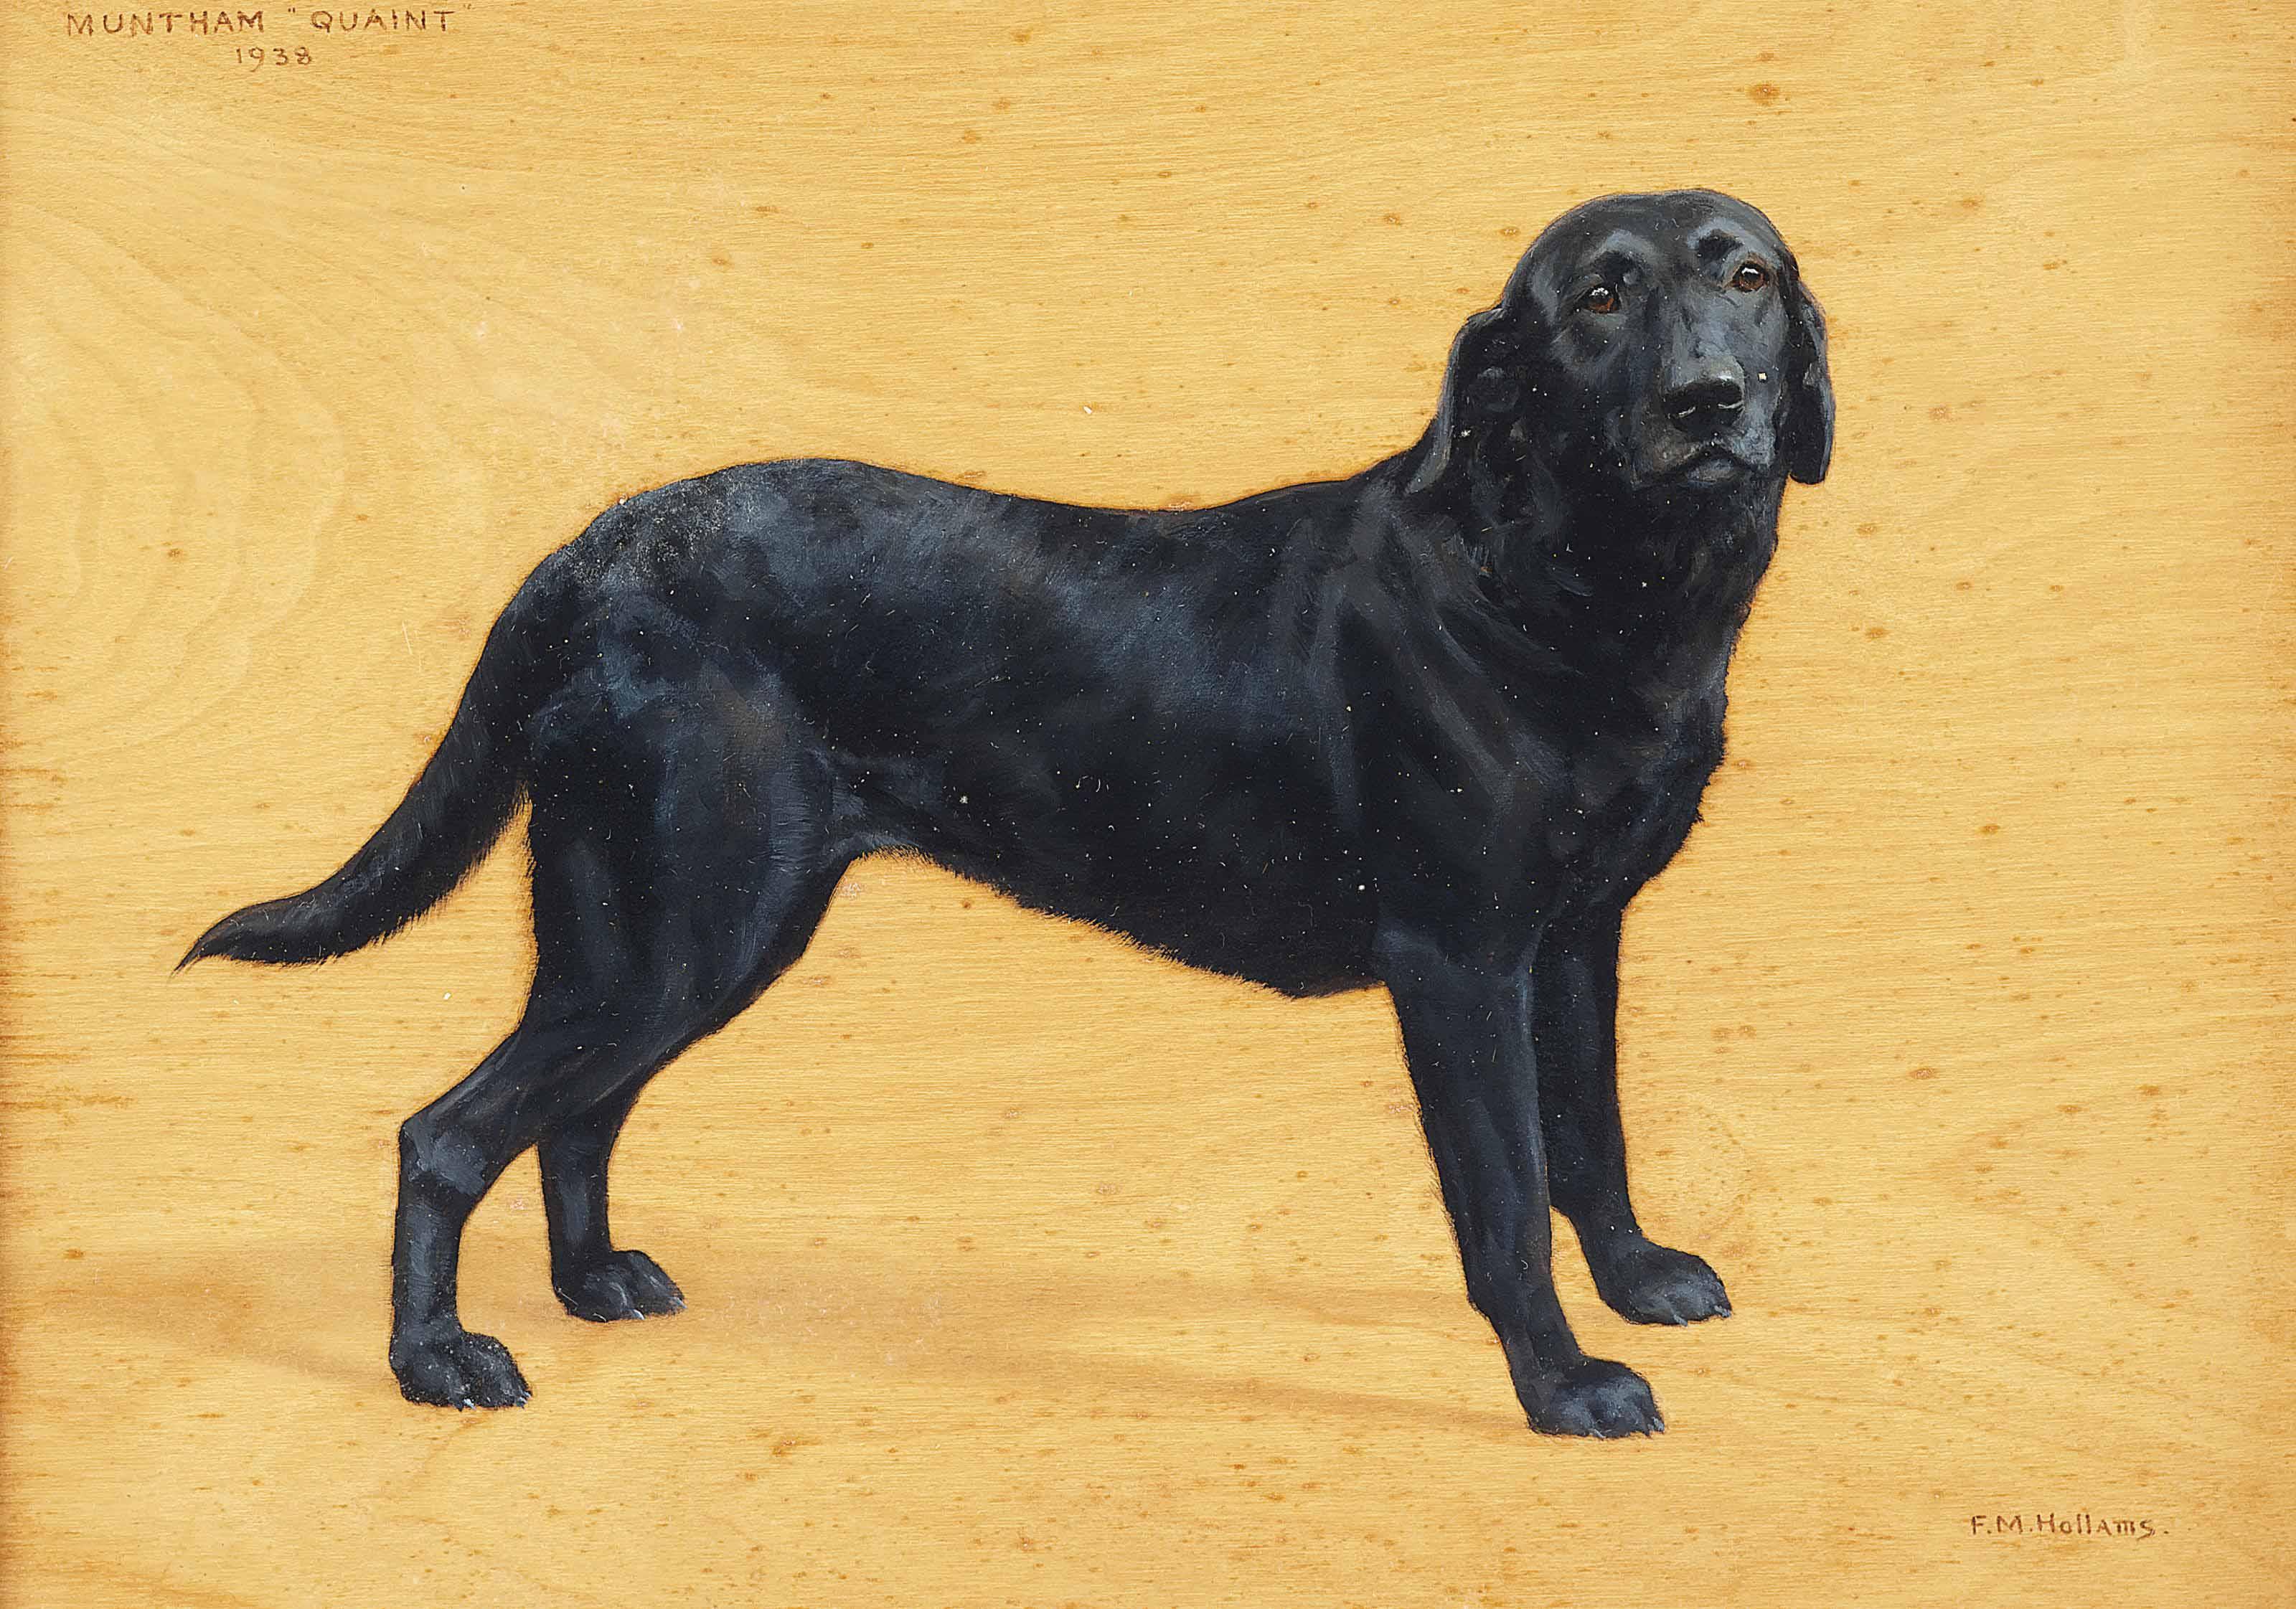 Muntham Quaint, a black labrador